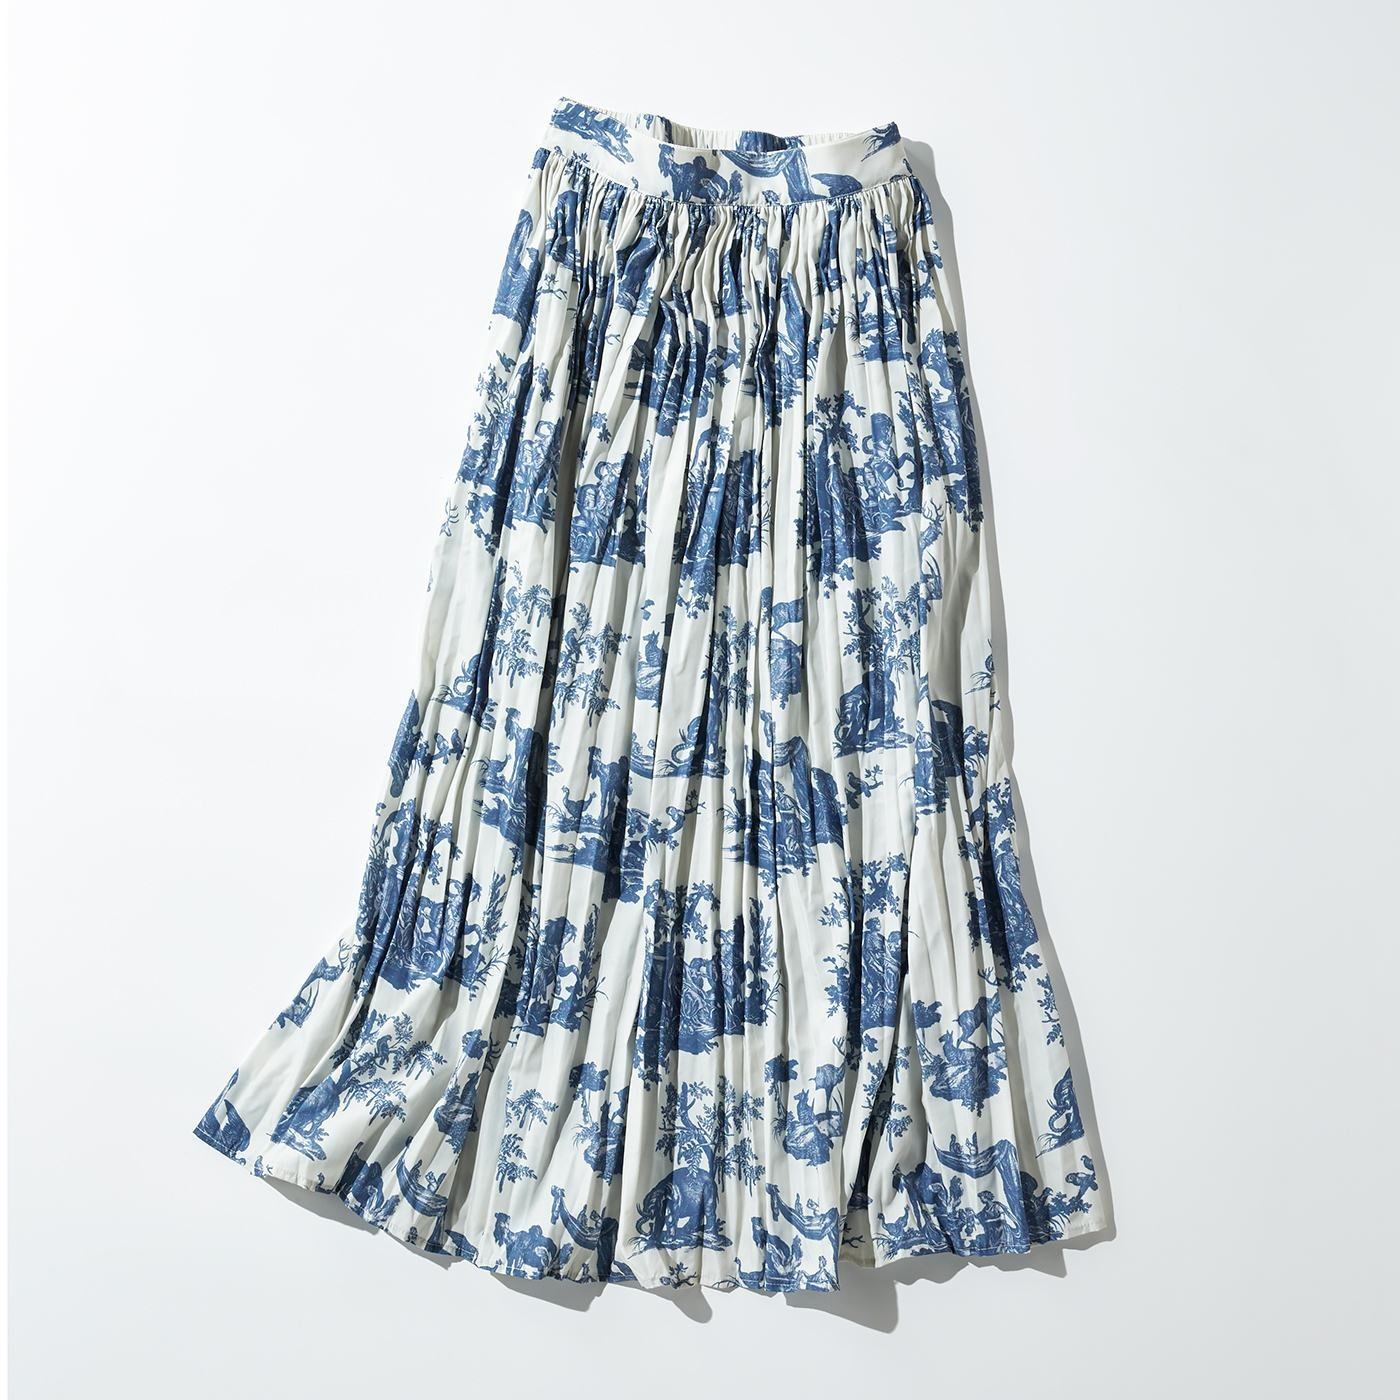 MEDE19F トワル・ド・ジュイ プリーツロングスカート〈グレイッシュネイビー〉